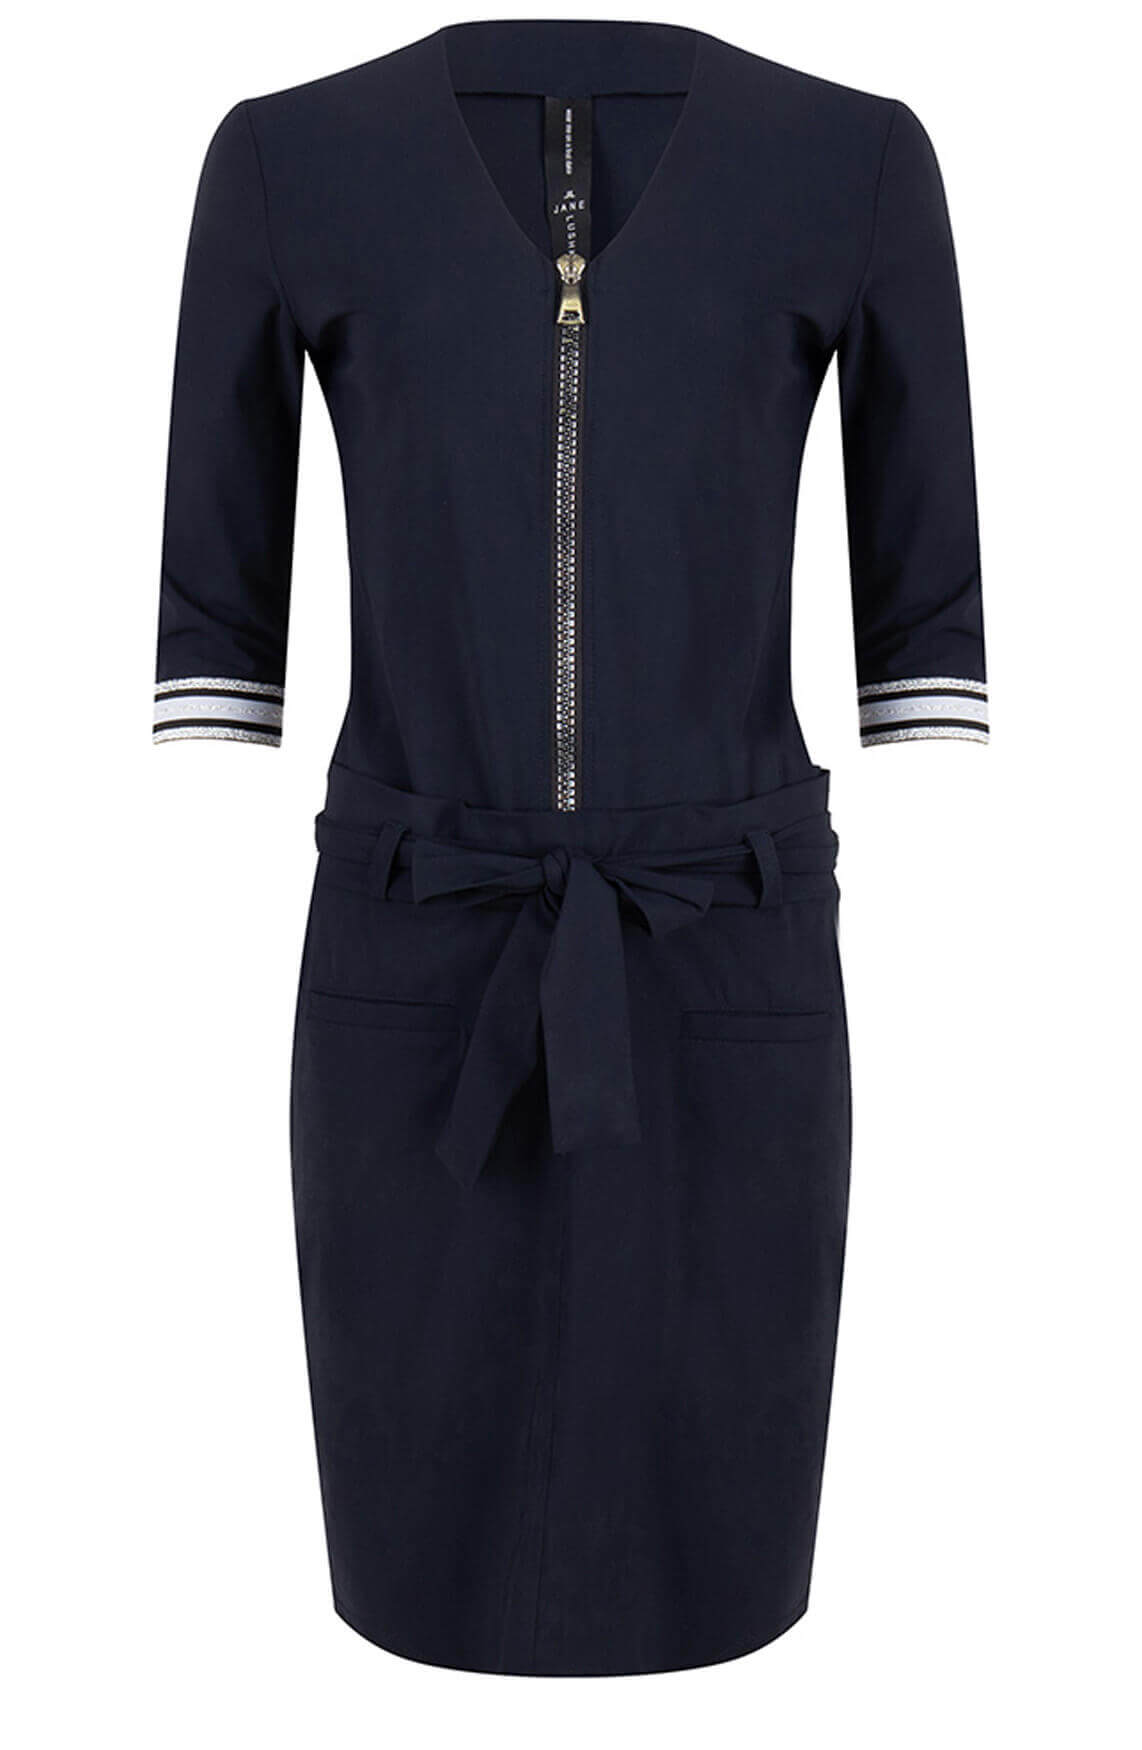 Jane Lushka Dames Leah jurk Blauw